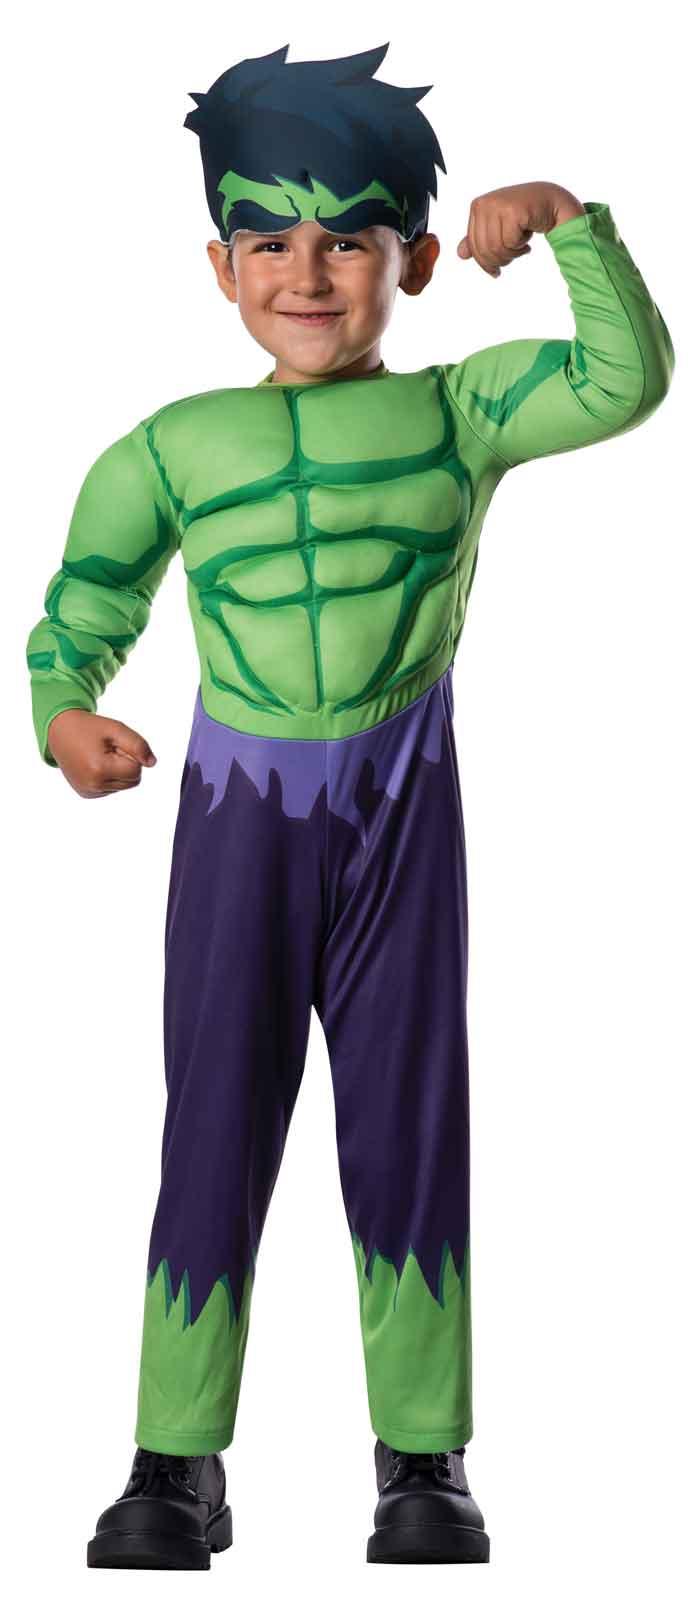 Avengers Assemble Hulk Toddler Boy Costume. SaveEnlarge  sc 1 st  Meningrey & Hulk Costume Boys - Meningrey